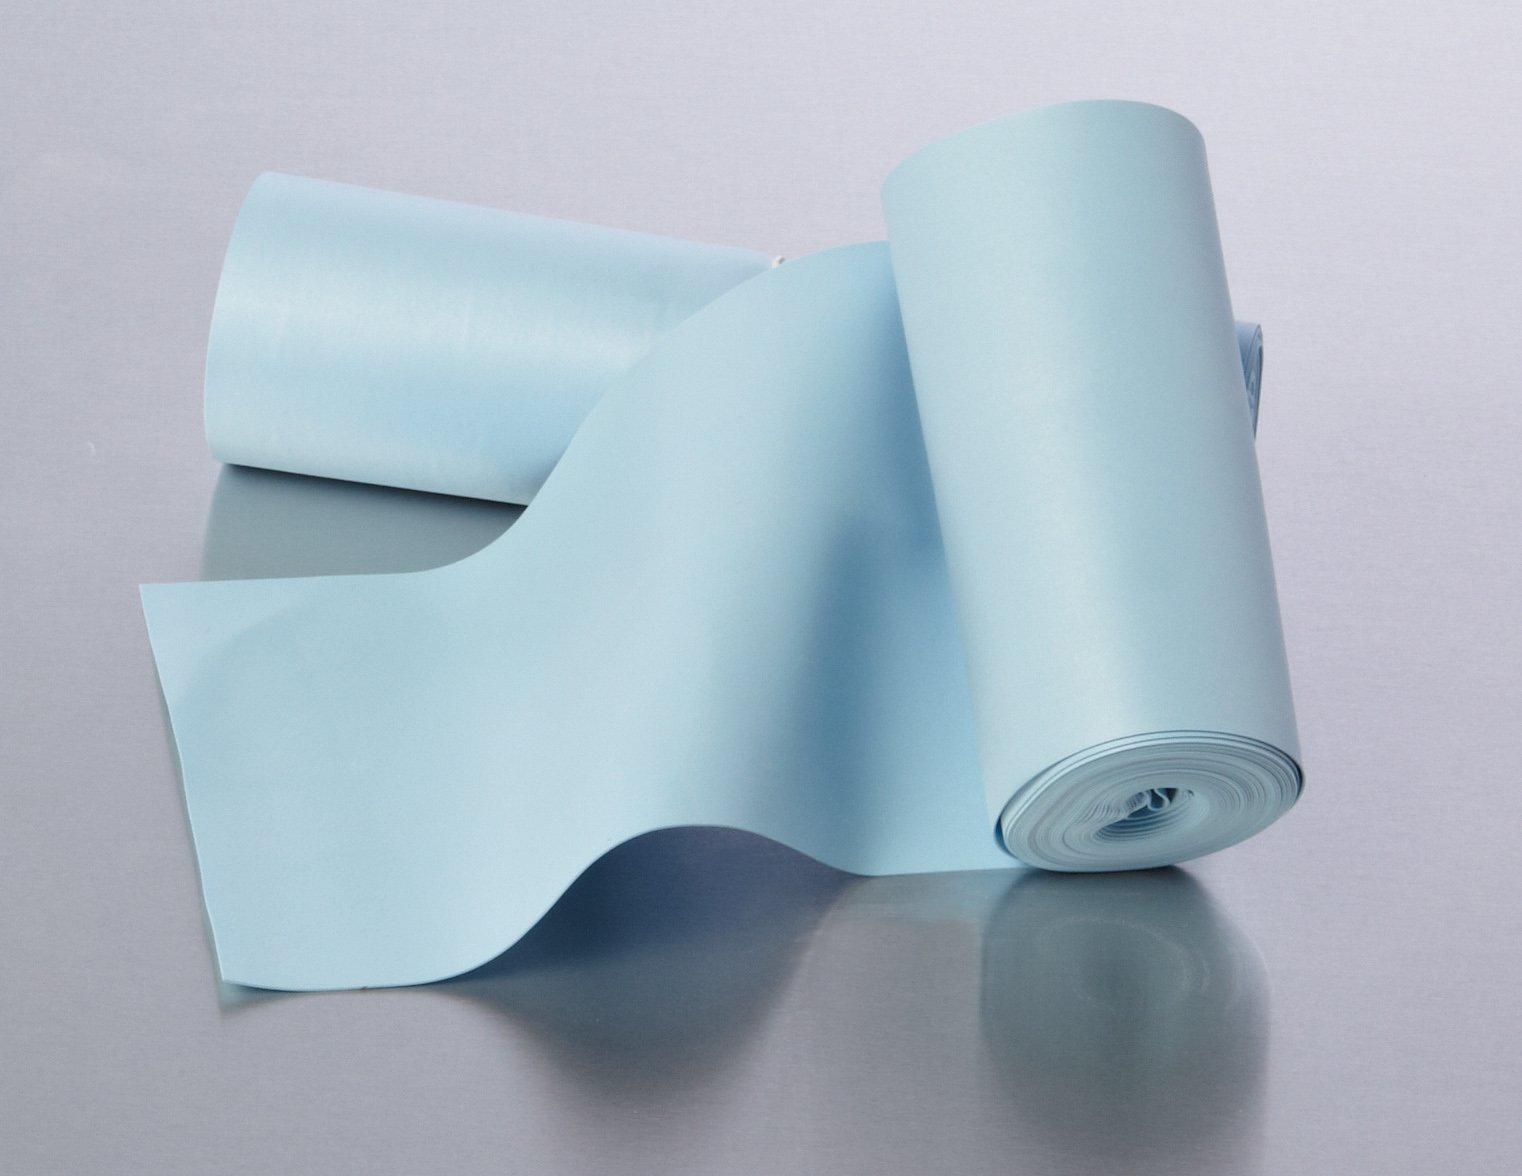 Medline DYNJ05916 Esmark Sterile Latex-Free Bandages, 4'' x 9' (Pack of 20) by Medline